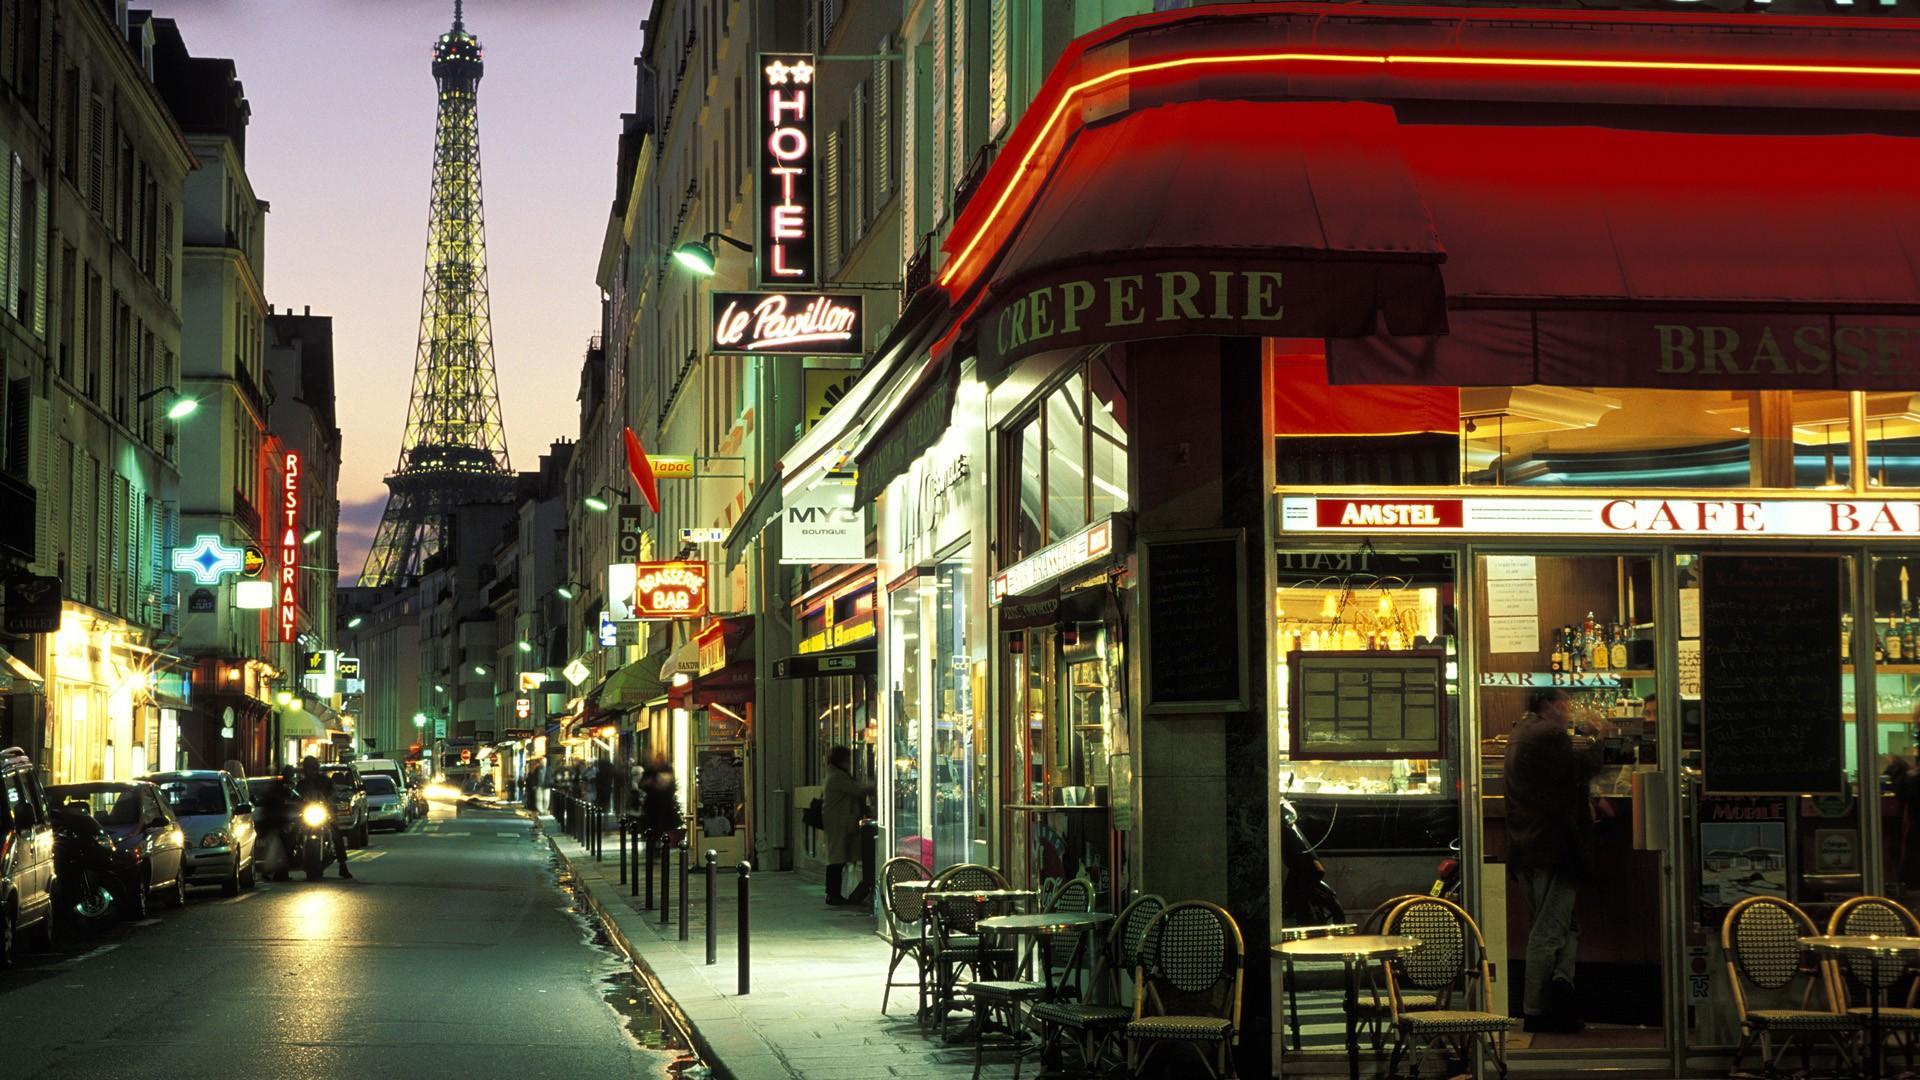 Paris Cafe Wallpaper HD Desktop Wallpapers 1920x1080